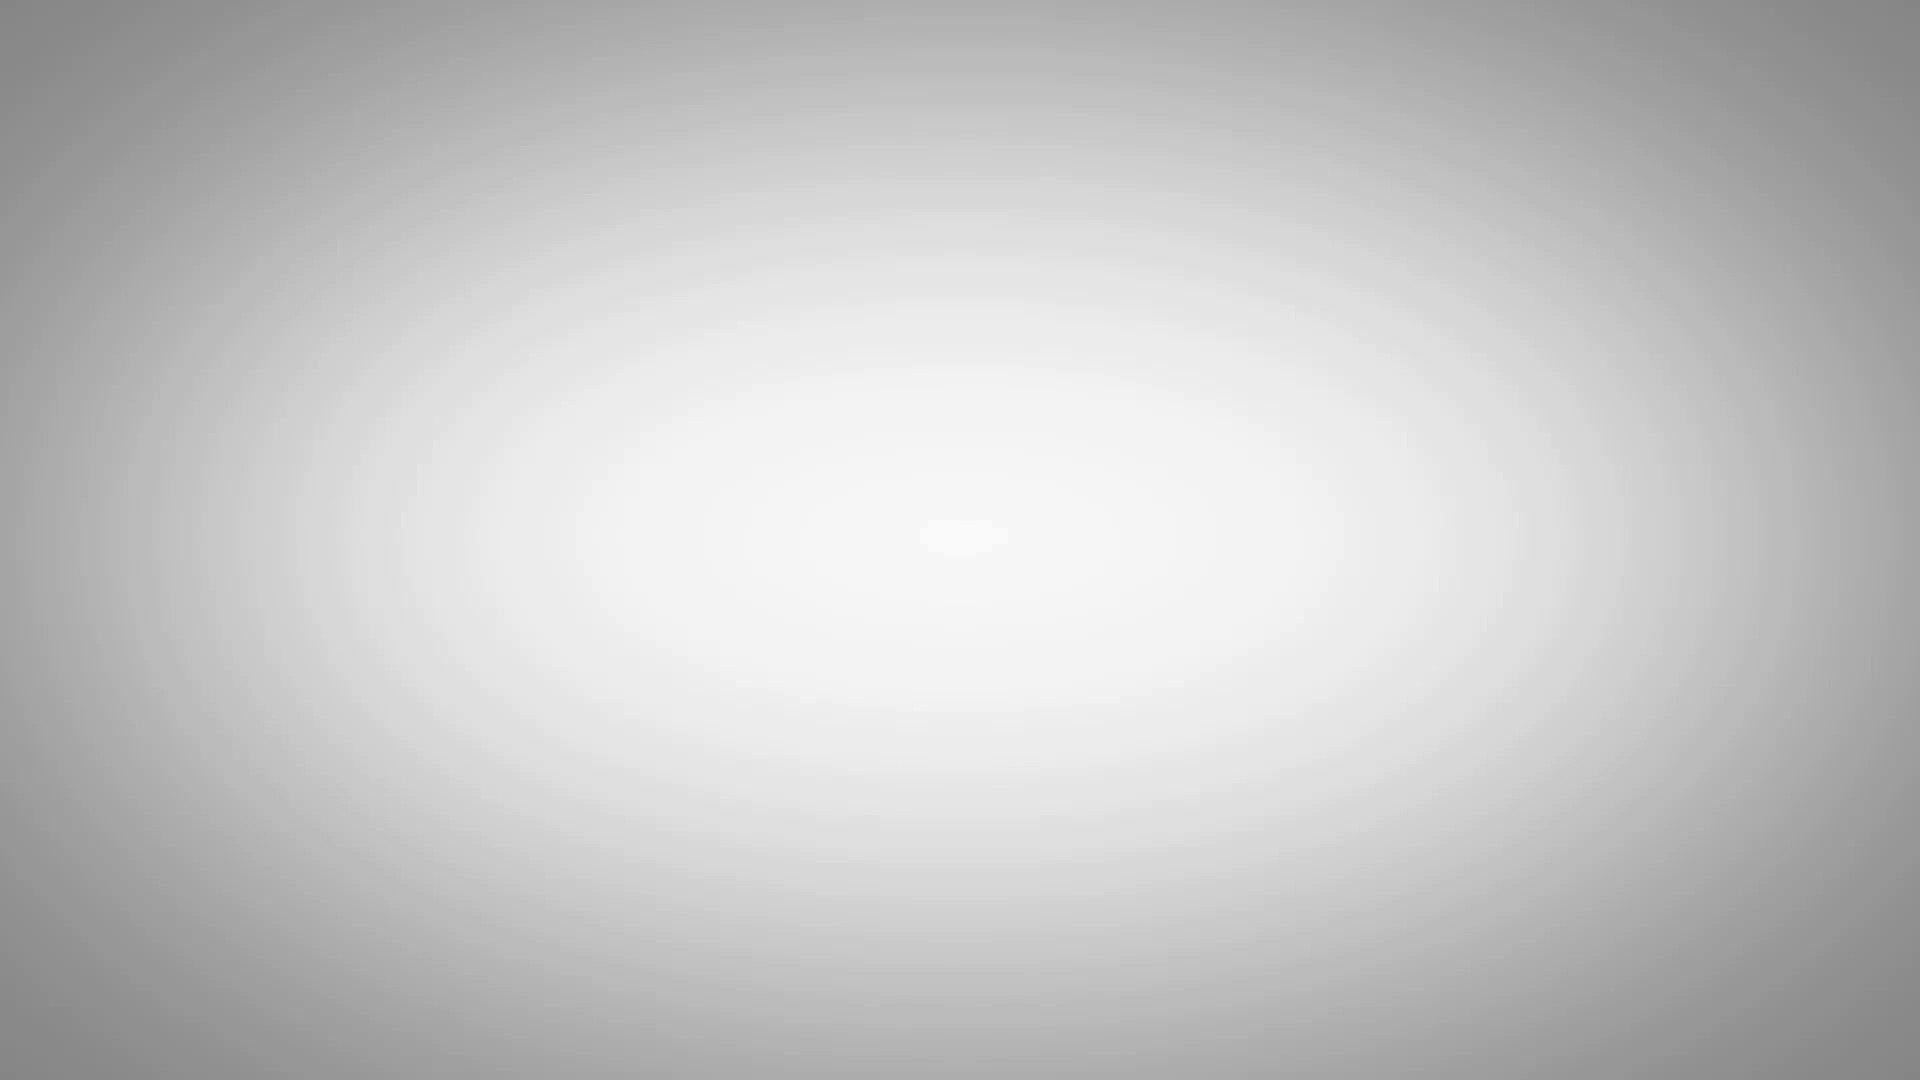 Bass Wajay Loud (Full Video Song) | $heraki ft. FlyHigh | Latest Punjabi Songs 2017 | Flixaap